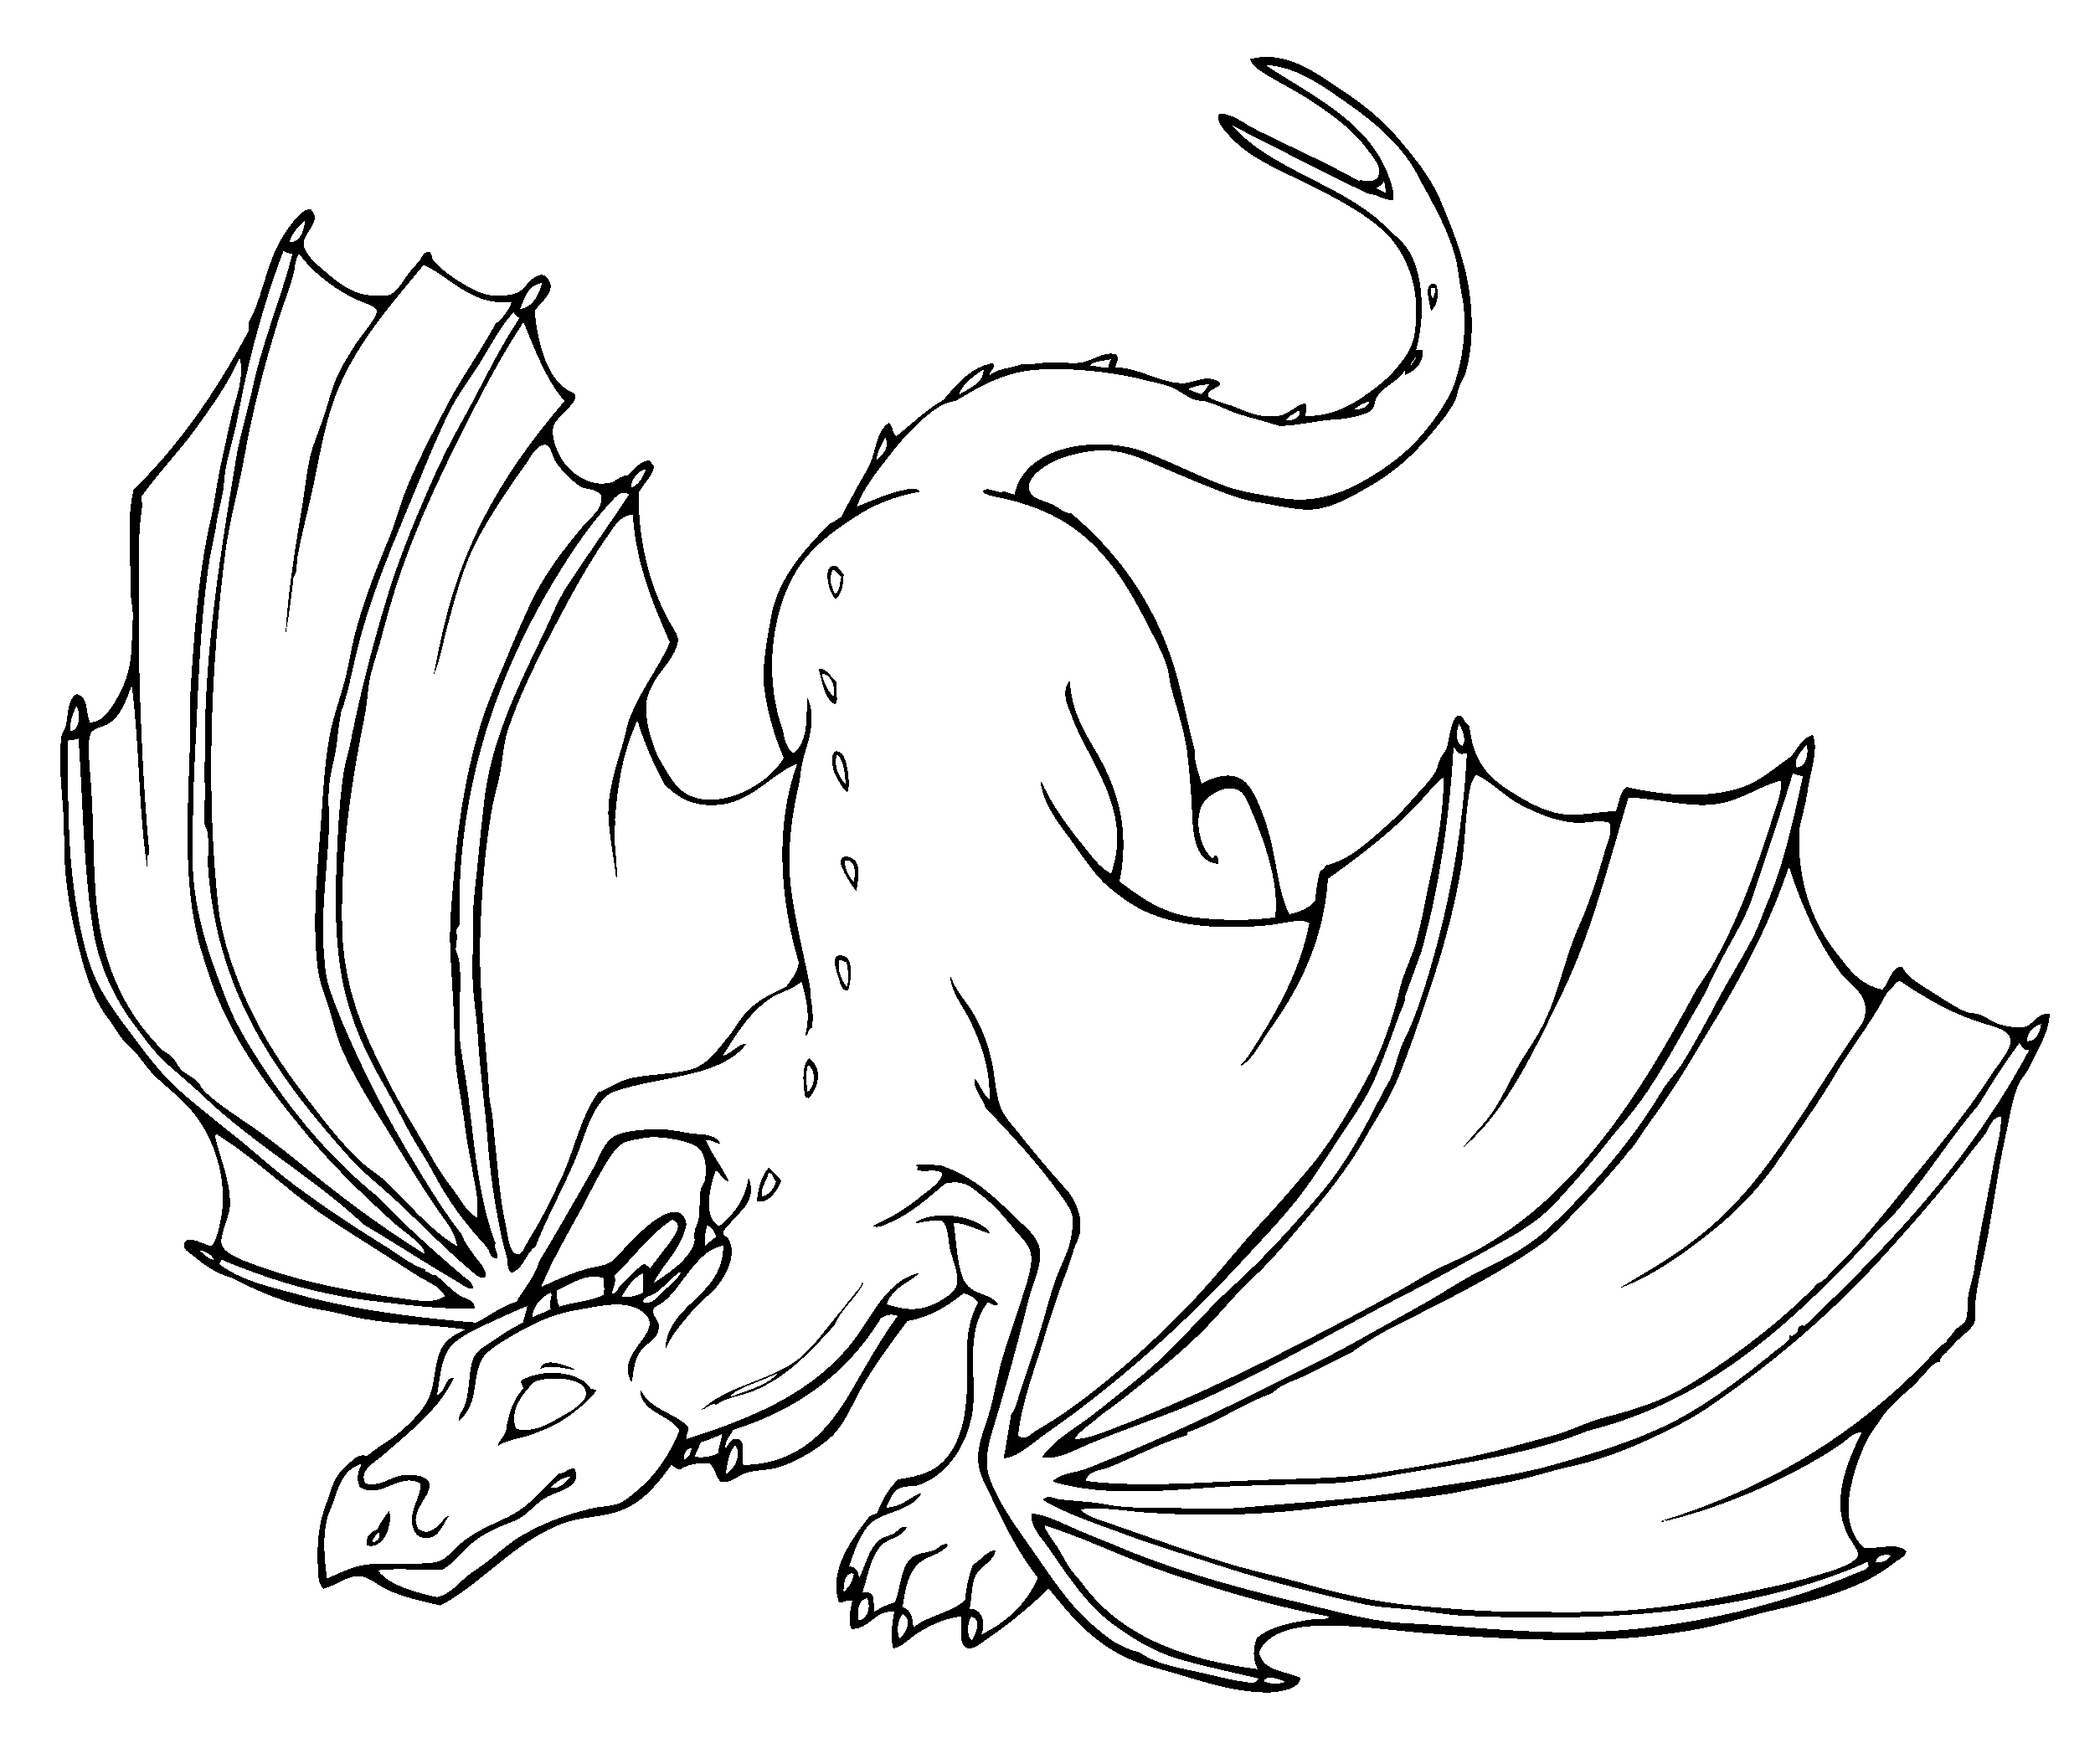 dragon_vector4.png (2508×2076) | Lineart: Dragons | Pinterest ...